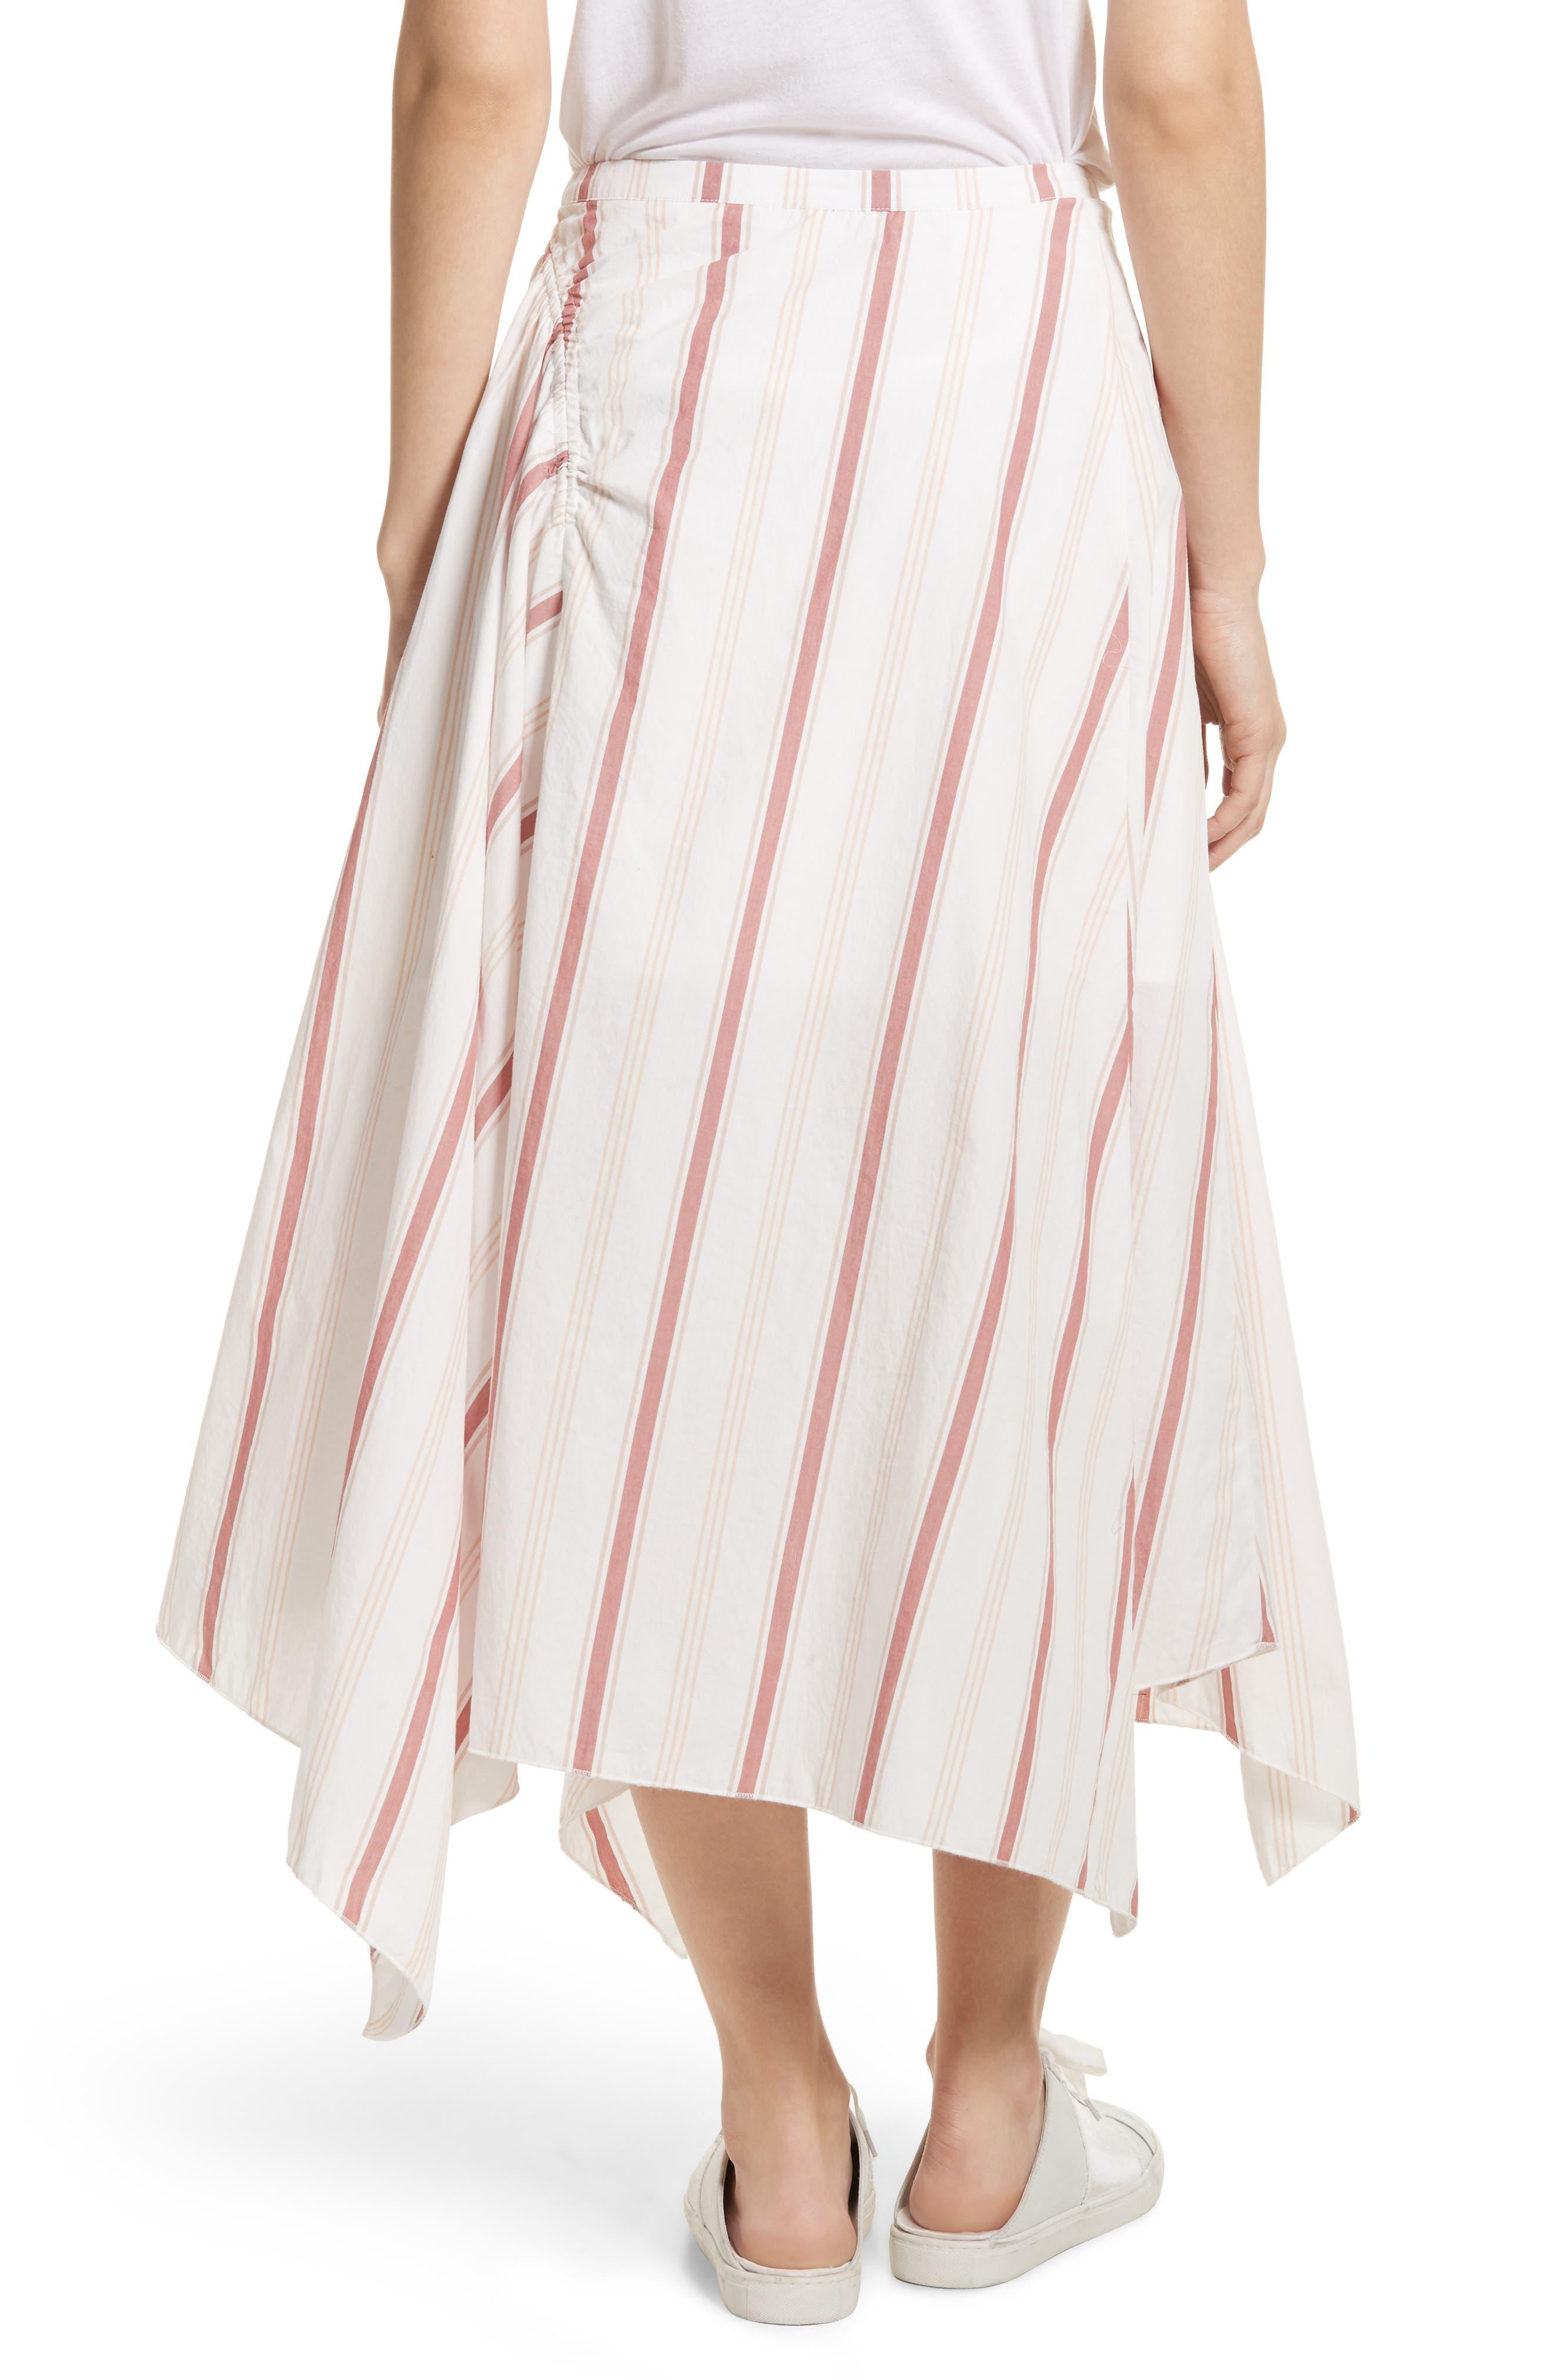 Hooked on Your Love Midi Skirt,                             Alternate thumbnail 2, color,                             903